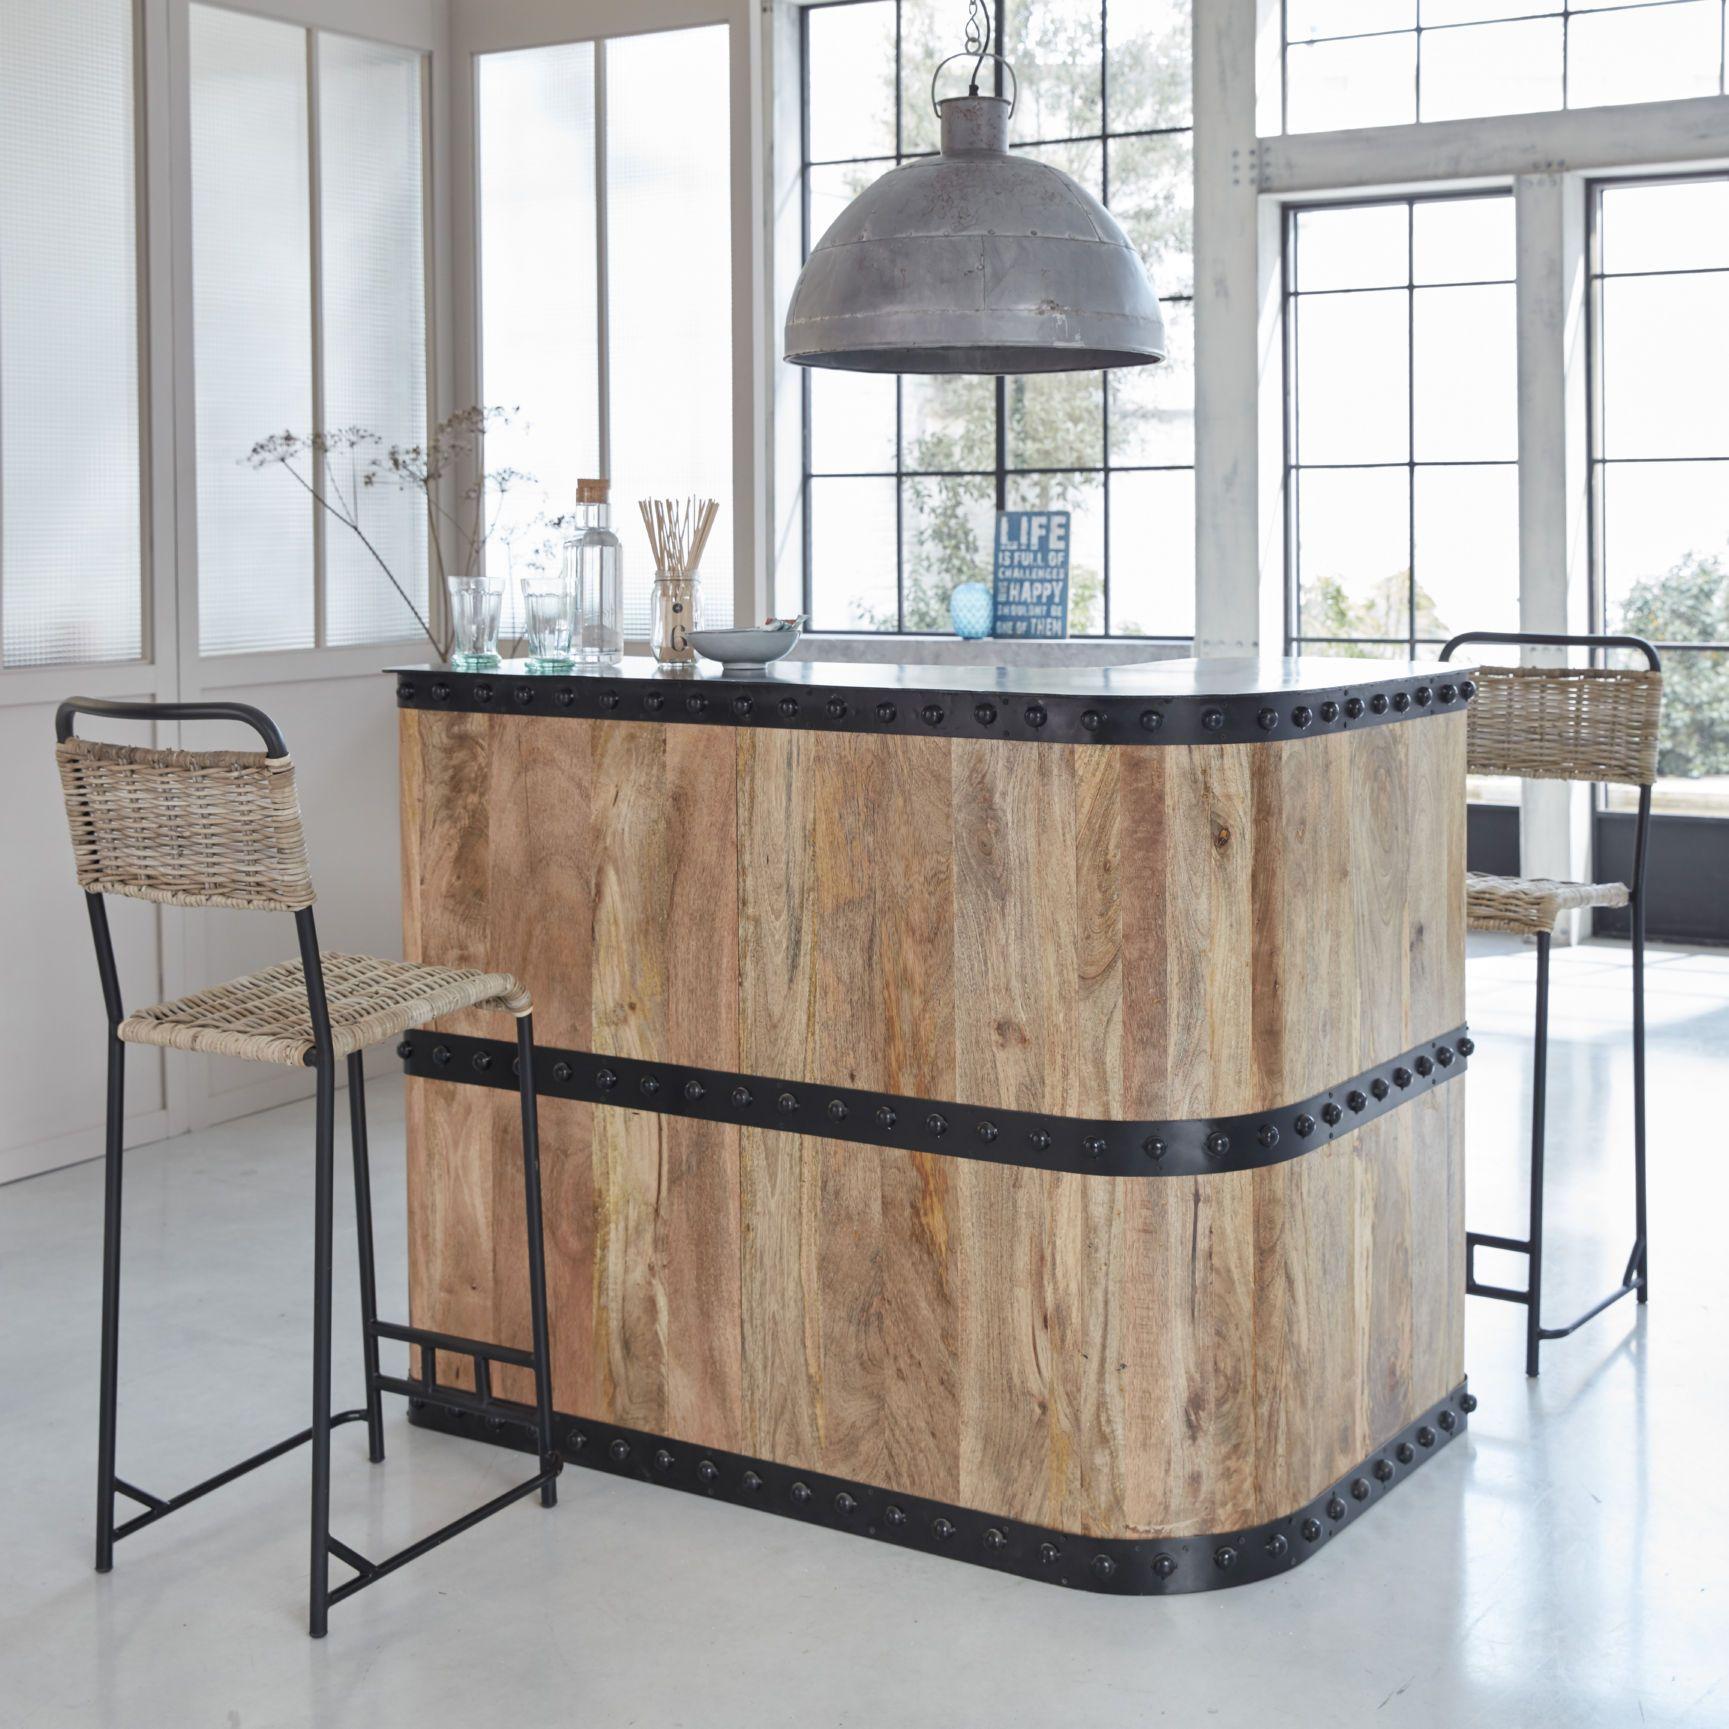 Meuble Mini Bar D Angle bar en angle industriel bois et métal | meuble bar, bar en